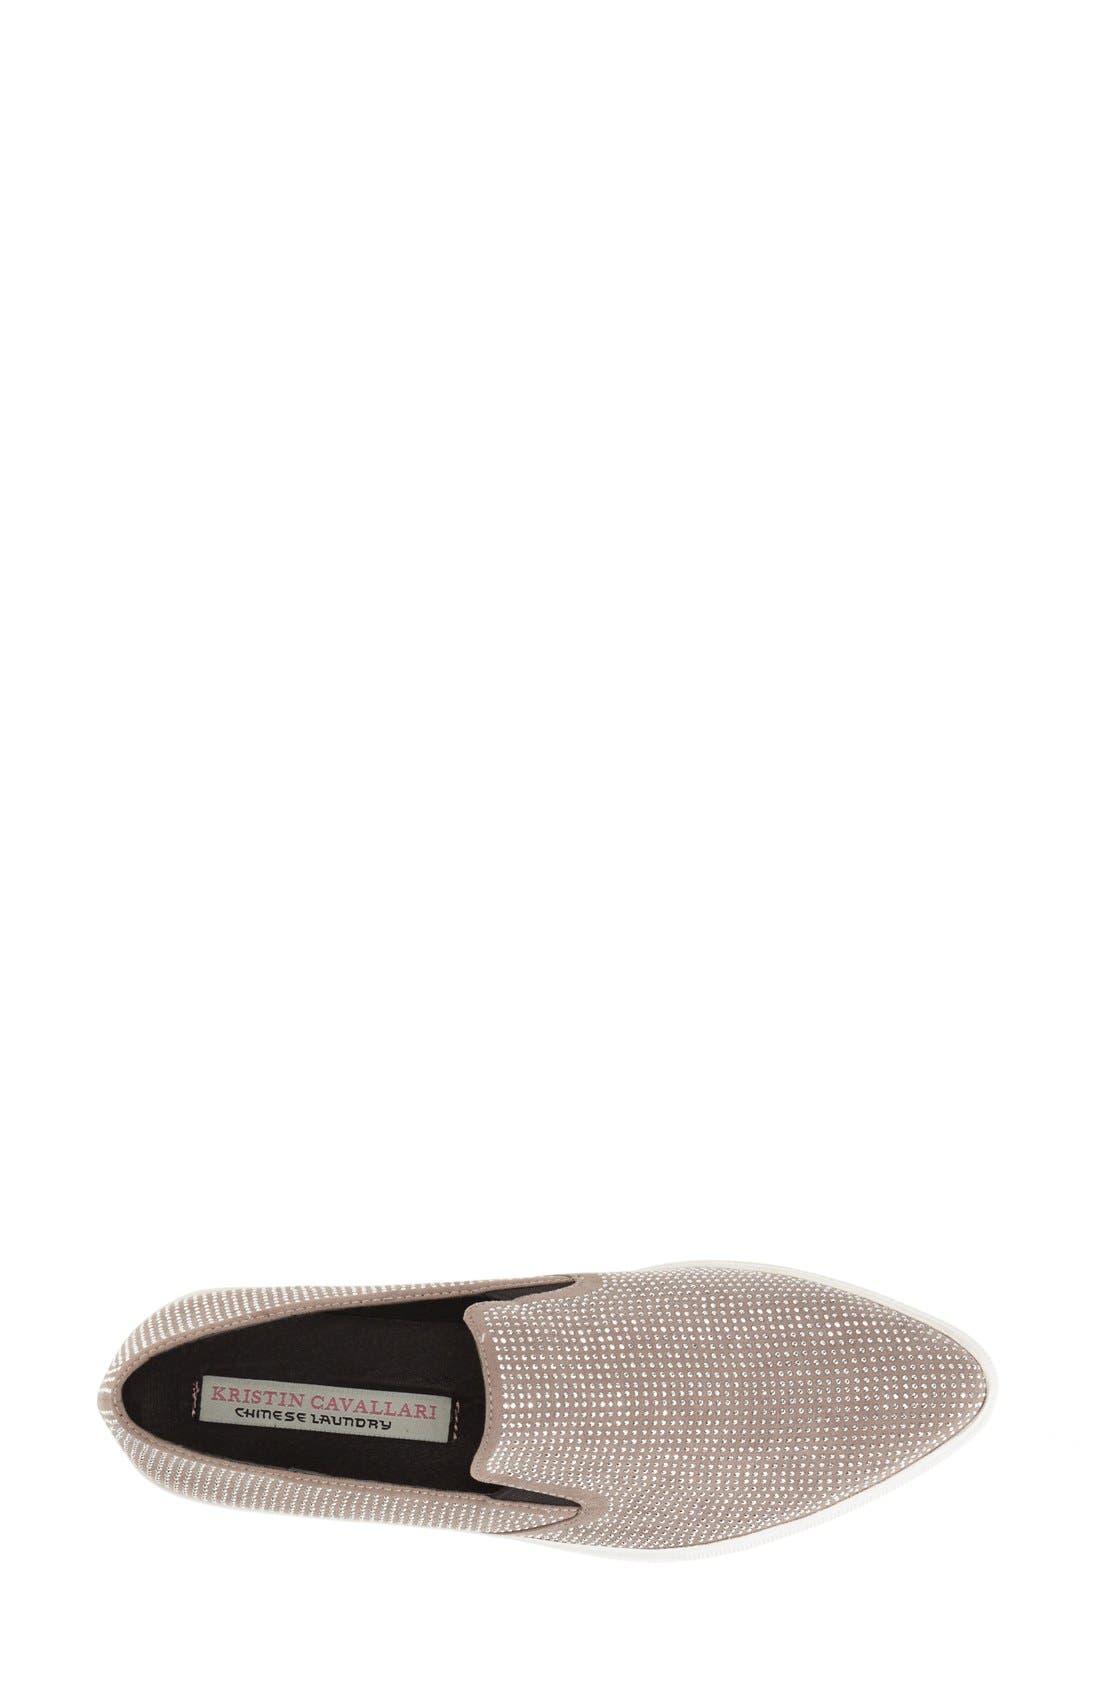 Alternate Image 3  - Kristin Cavallari 'Outcome' Embellished Slip-On Sneaker (Women)